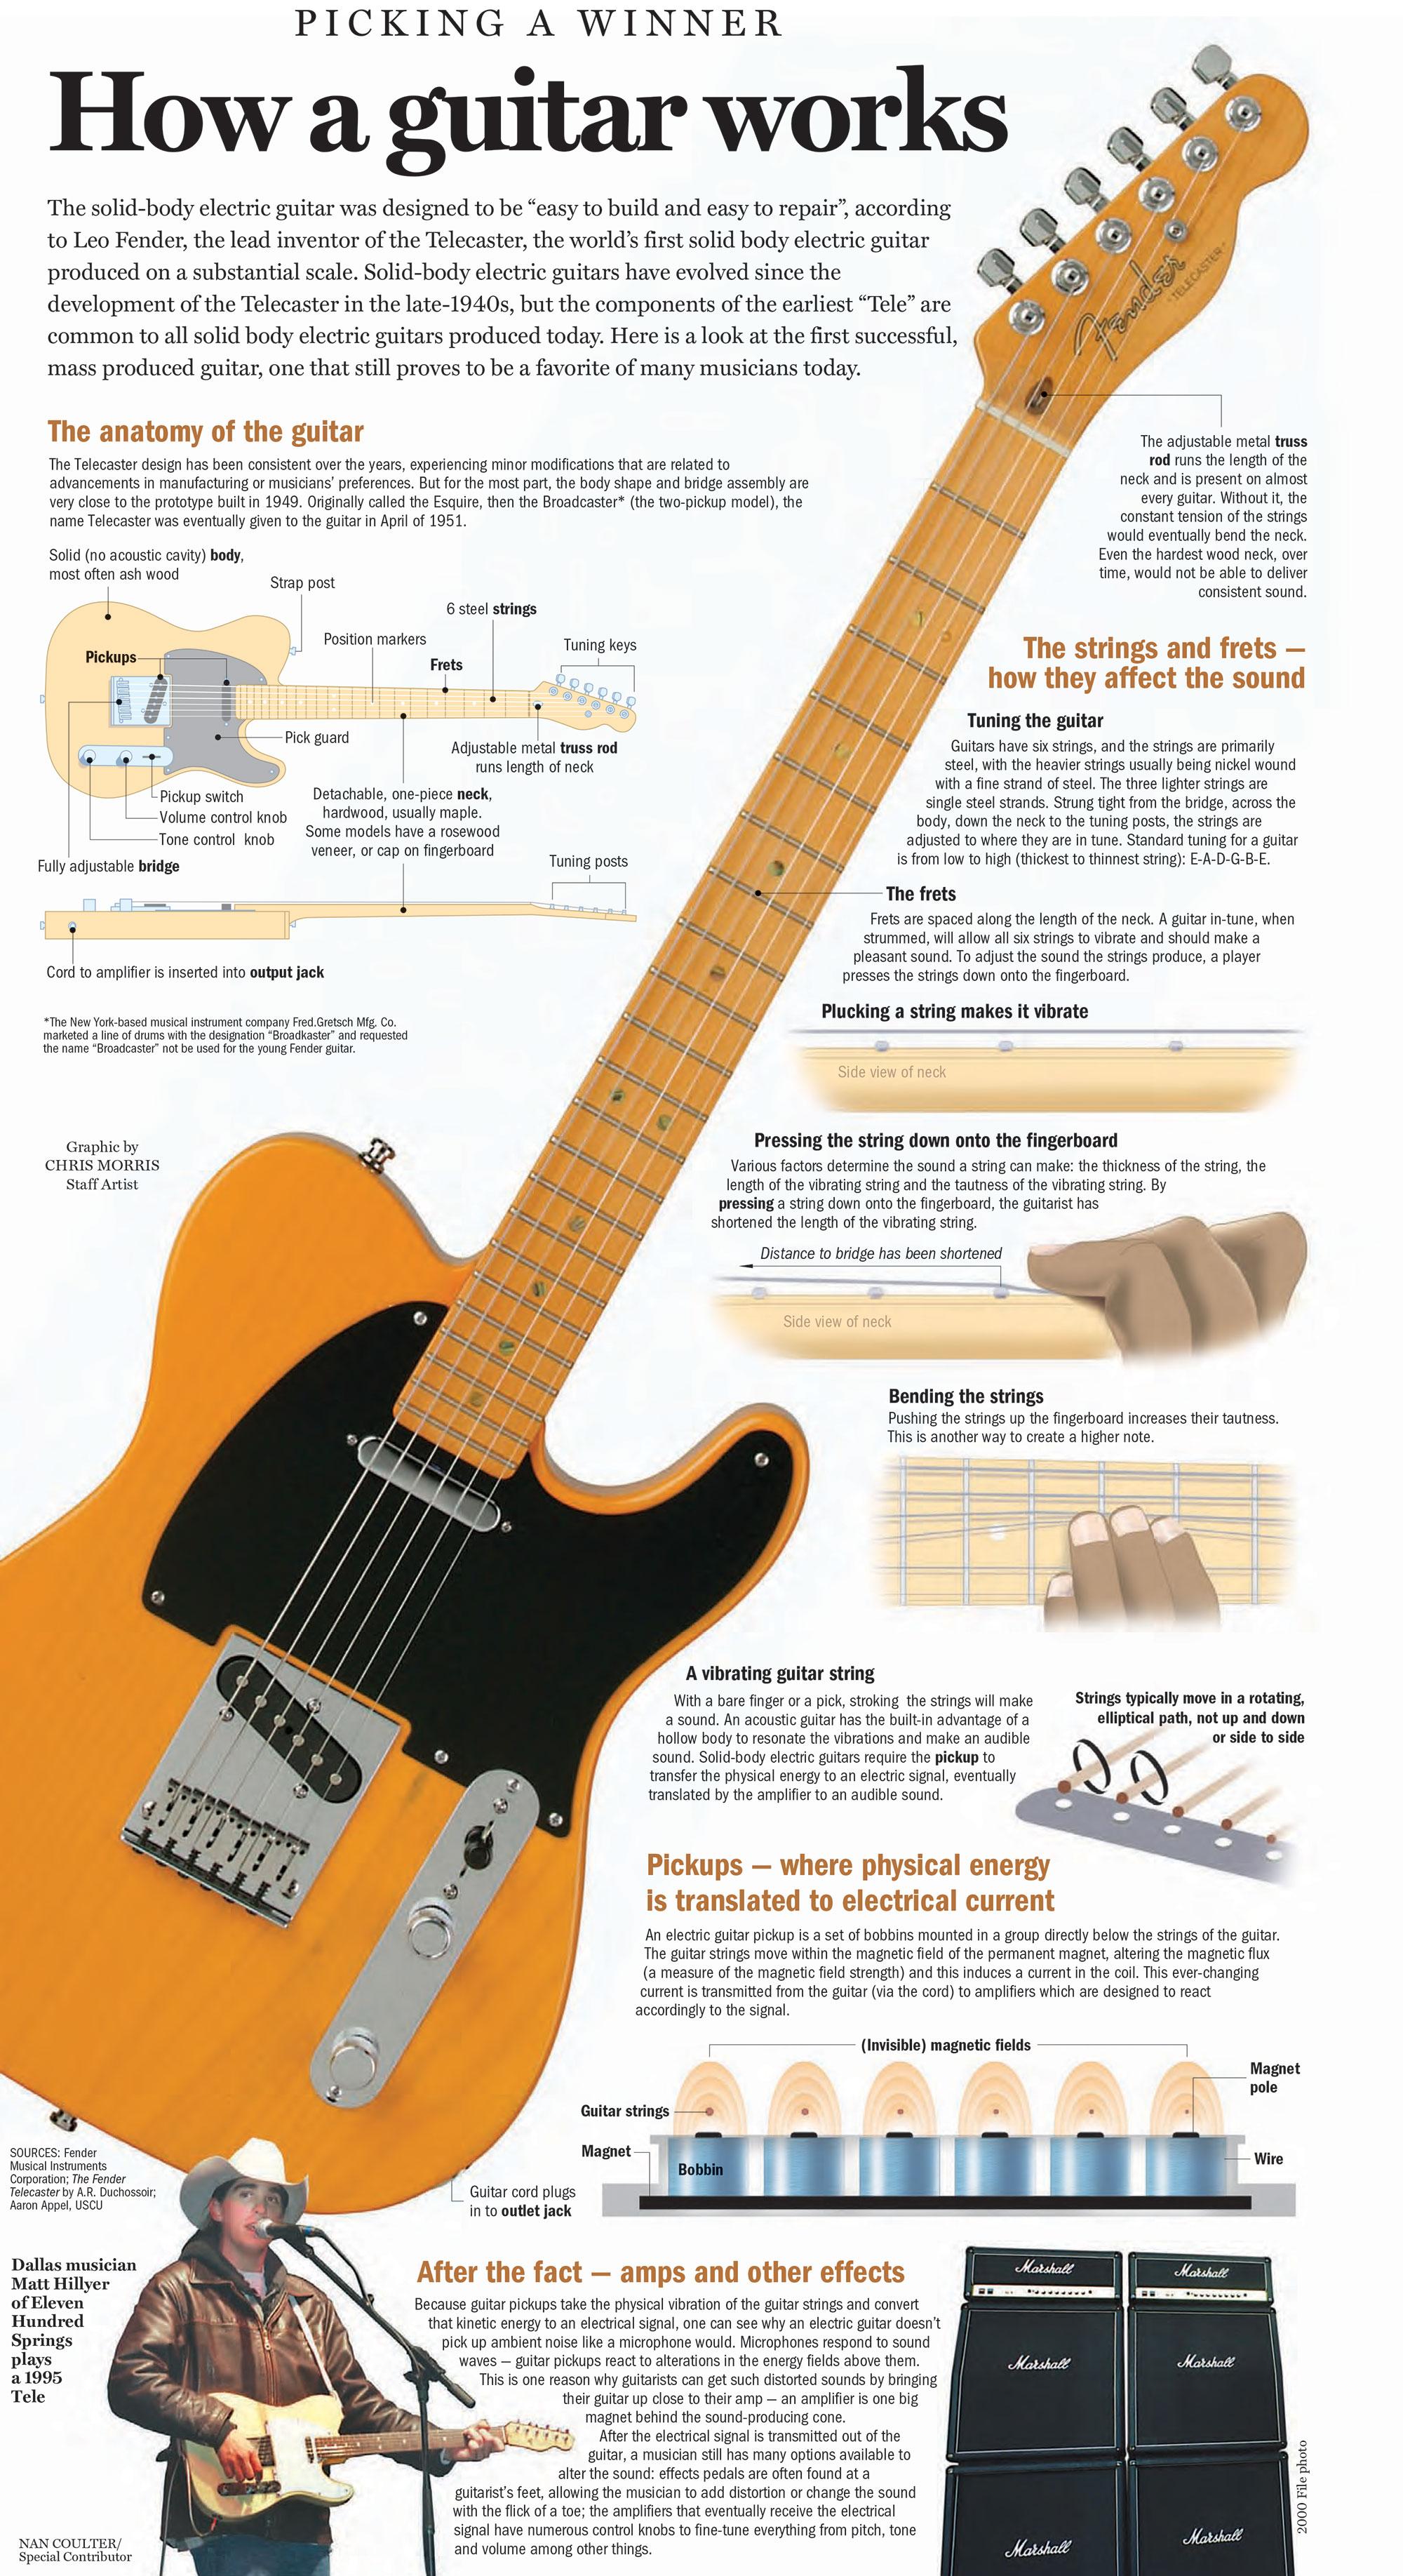 How a guitar works – Chris Morris Illustration